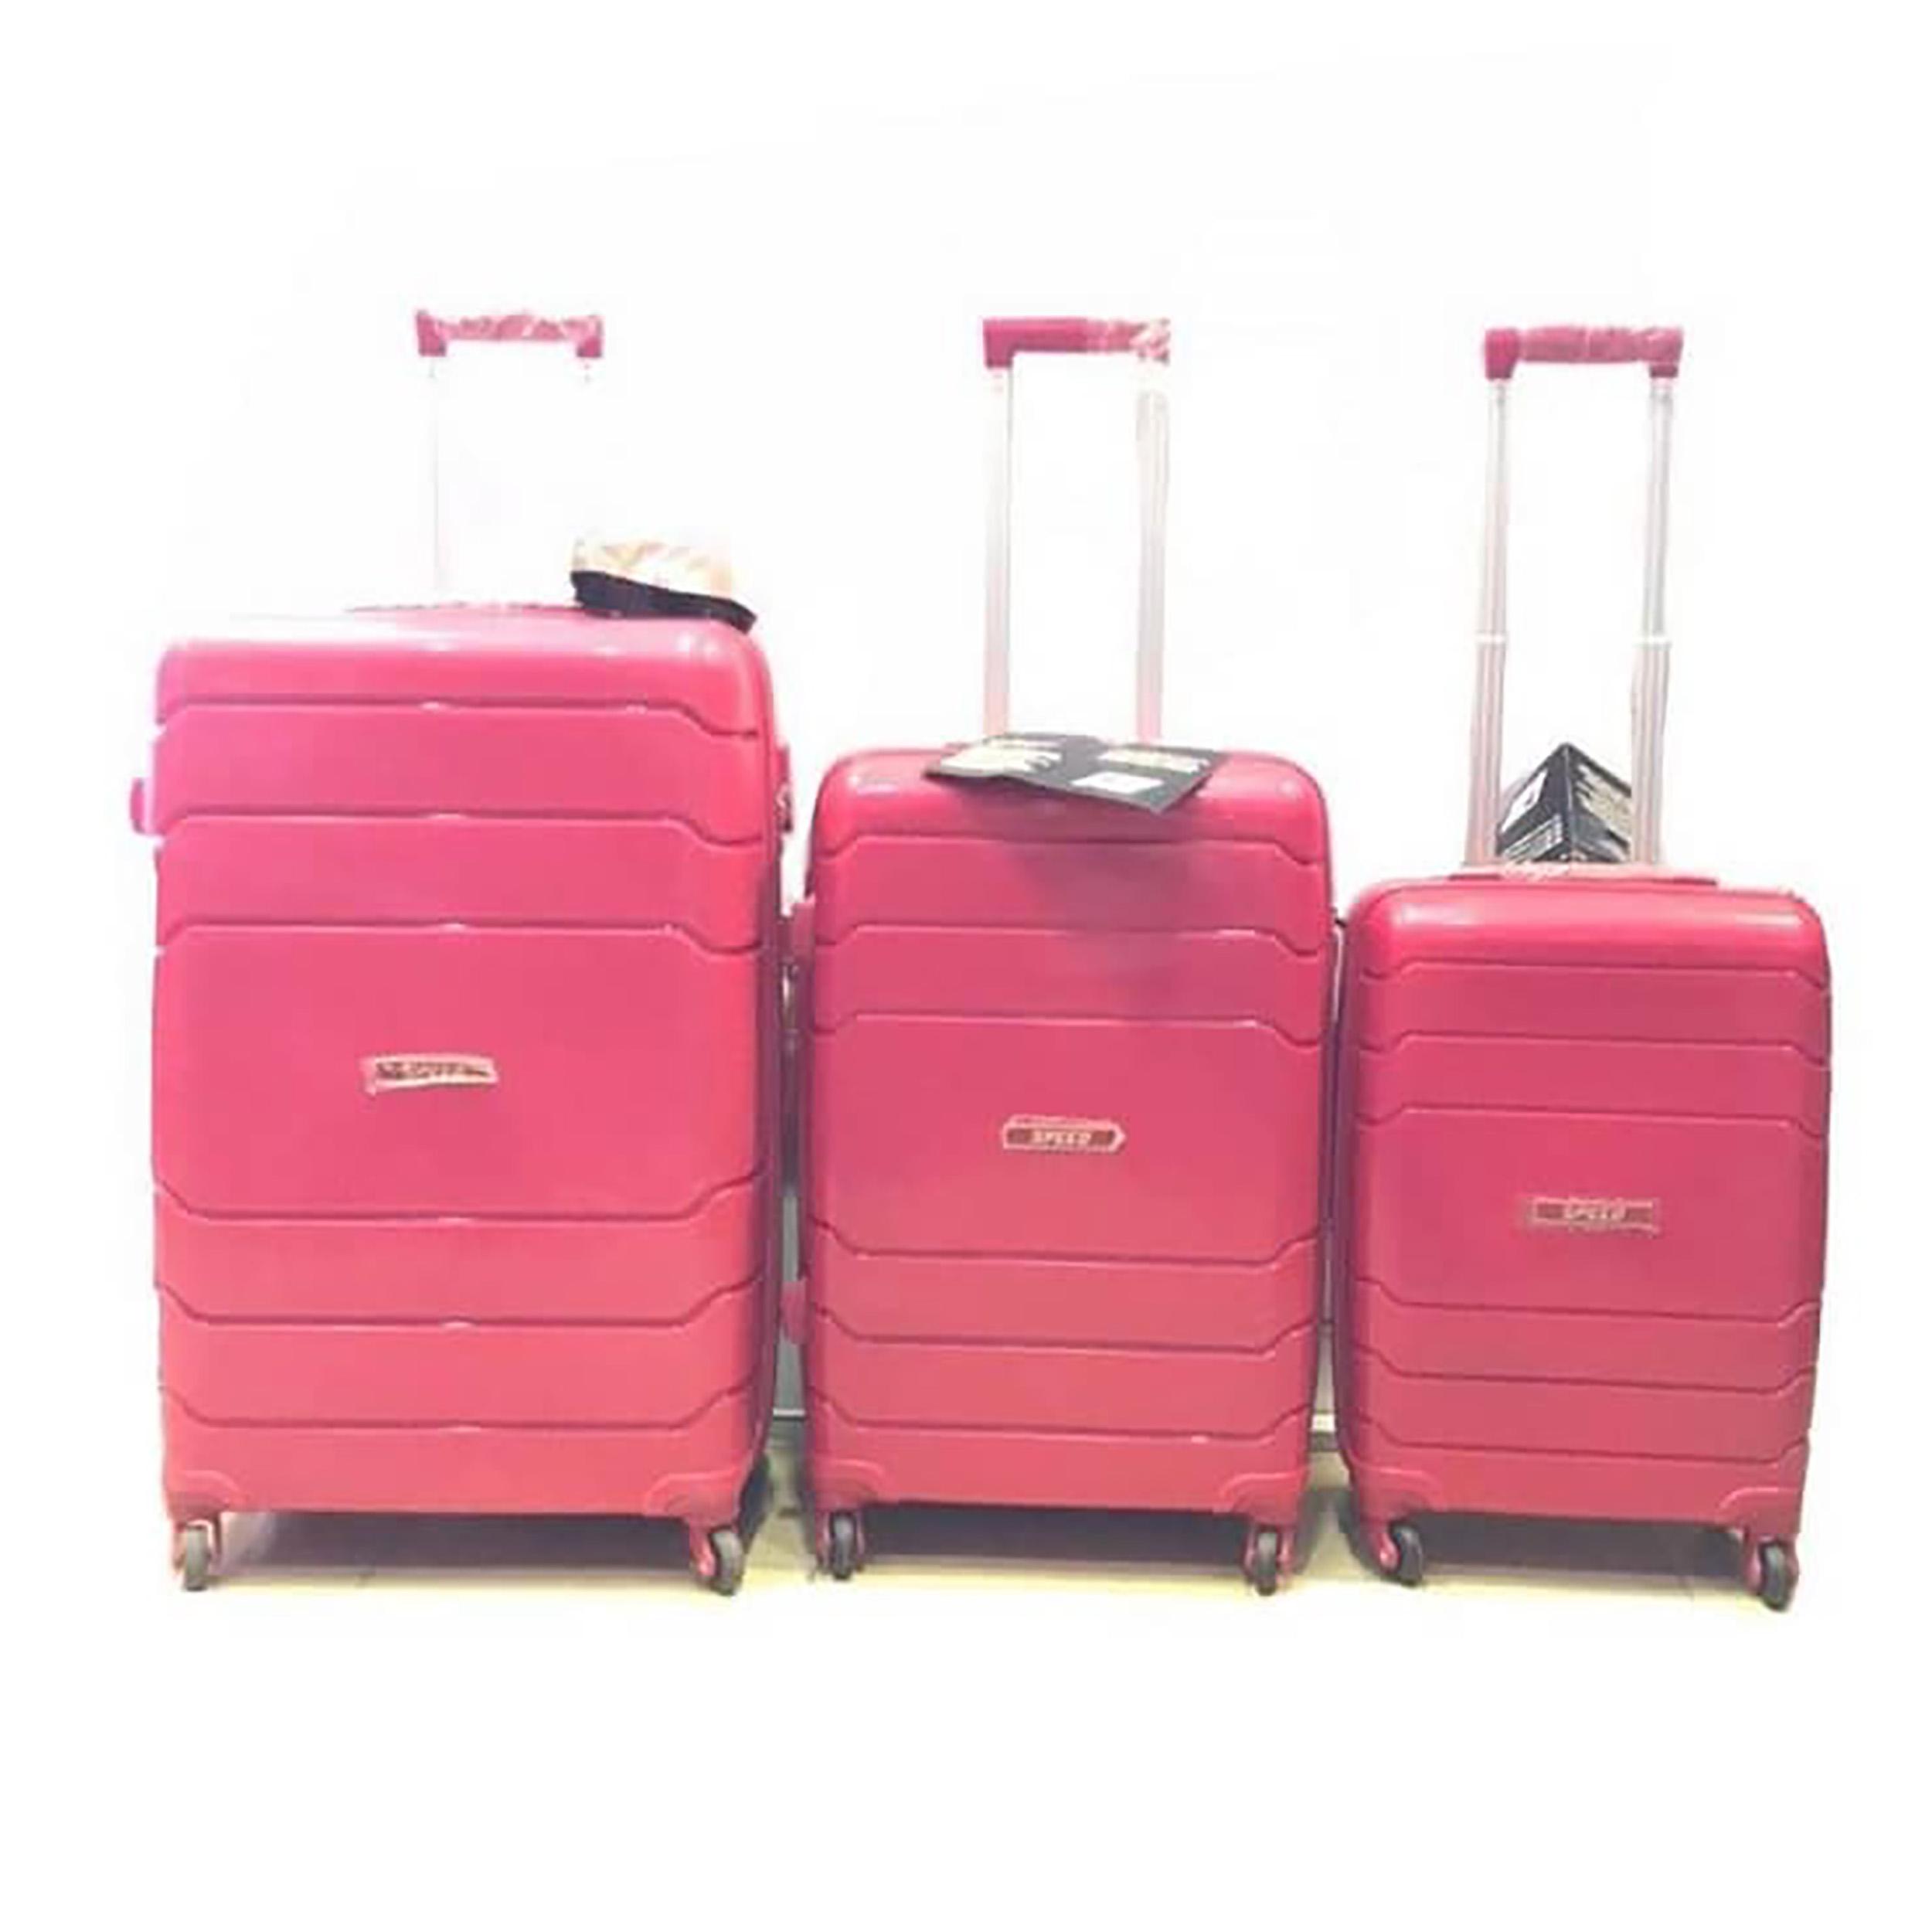 مجموعه سه عددی چمدان اسپید کد B016 main 1 8